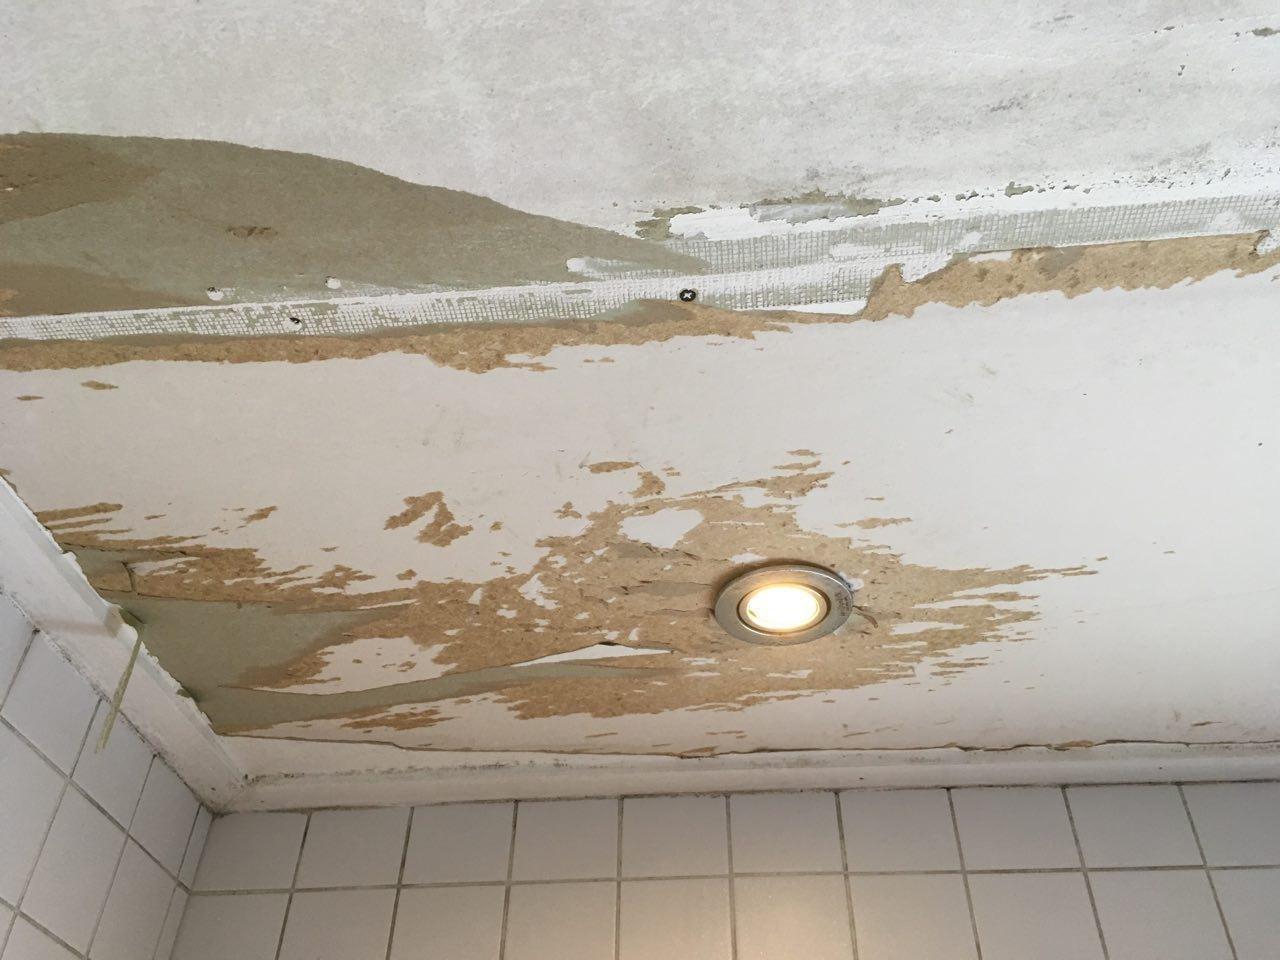 Behang Plafond Badkamer : Behang verwijderen van plafond badkamer werkspot